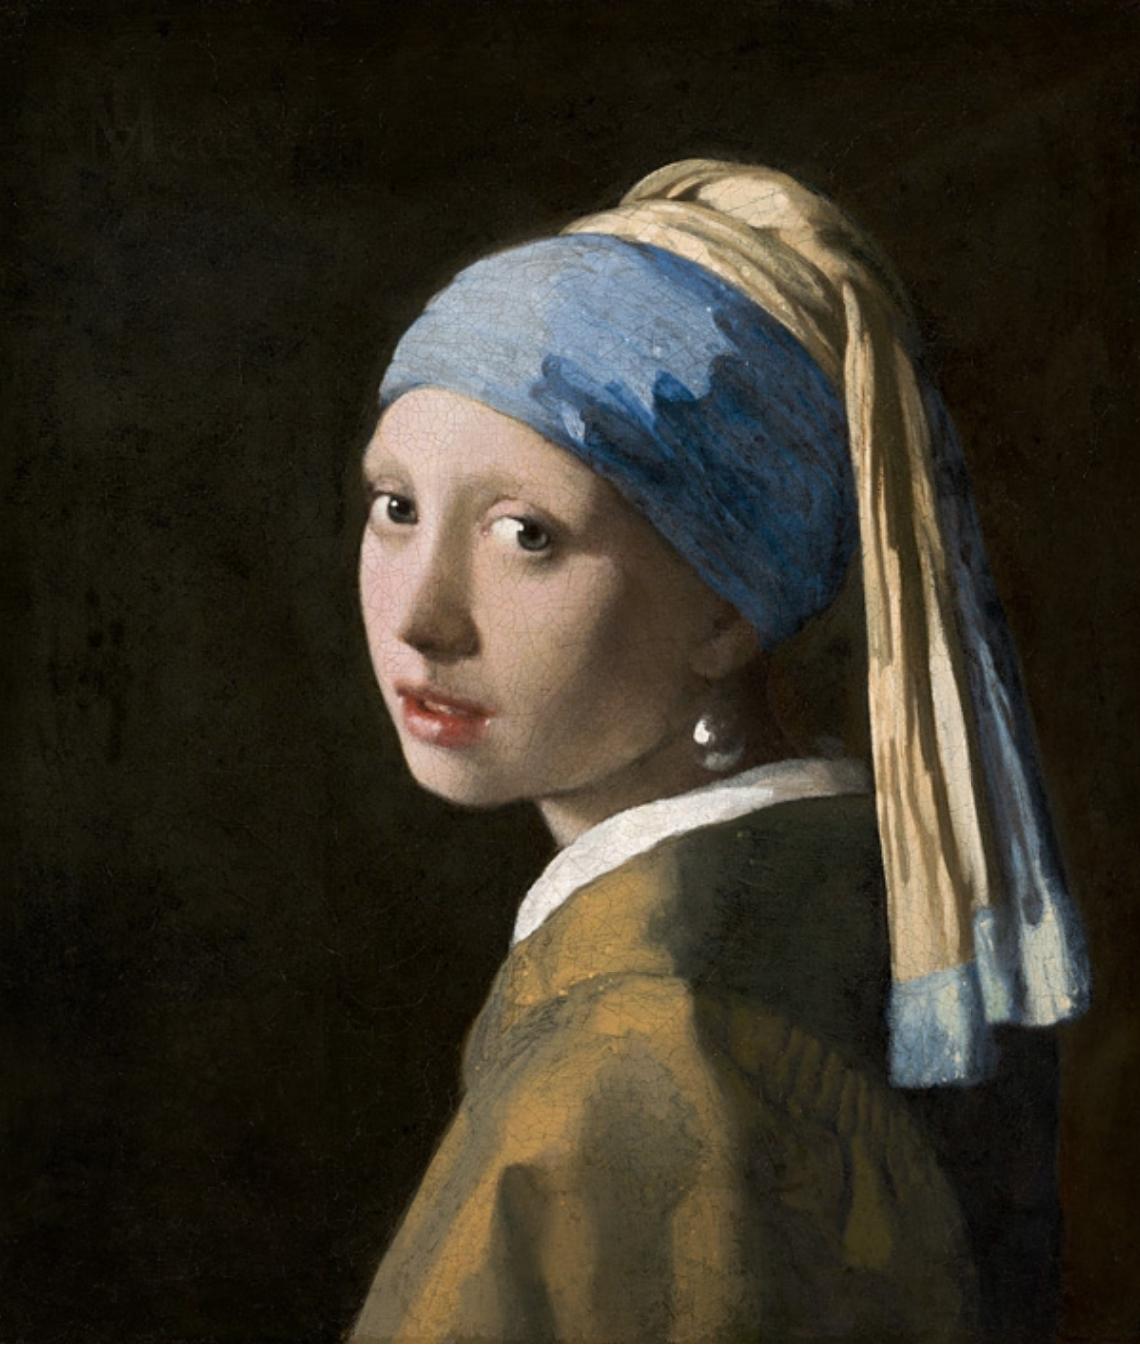 2. Ragazza col turbante – Johannes Vermeer (c. 1665-66) - Mauritshuis, L'Aia